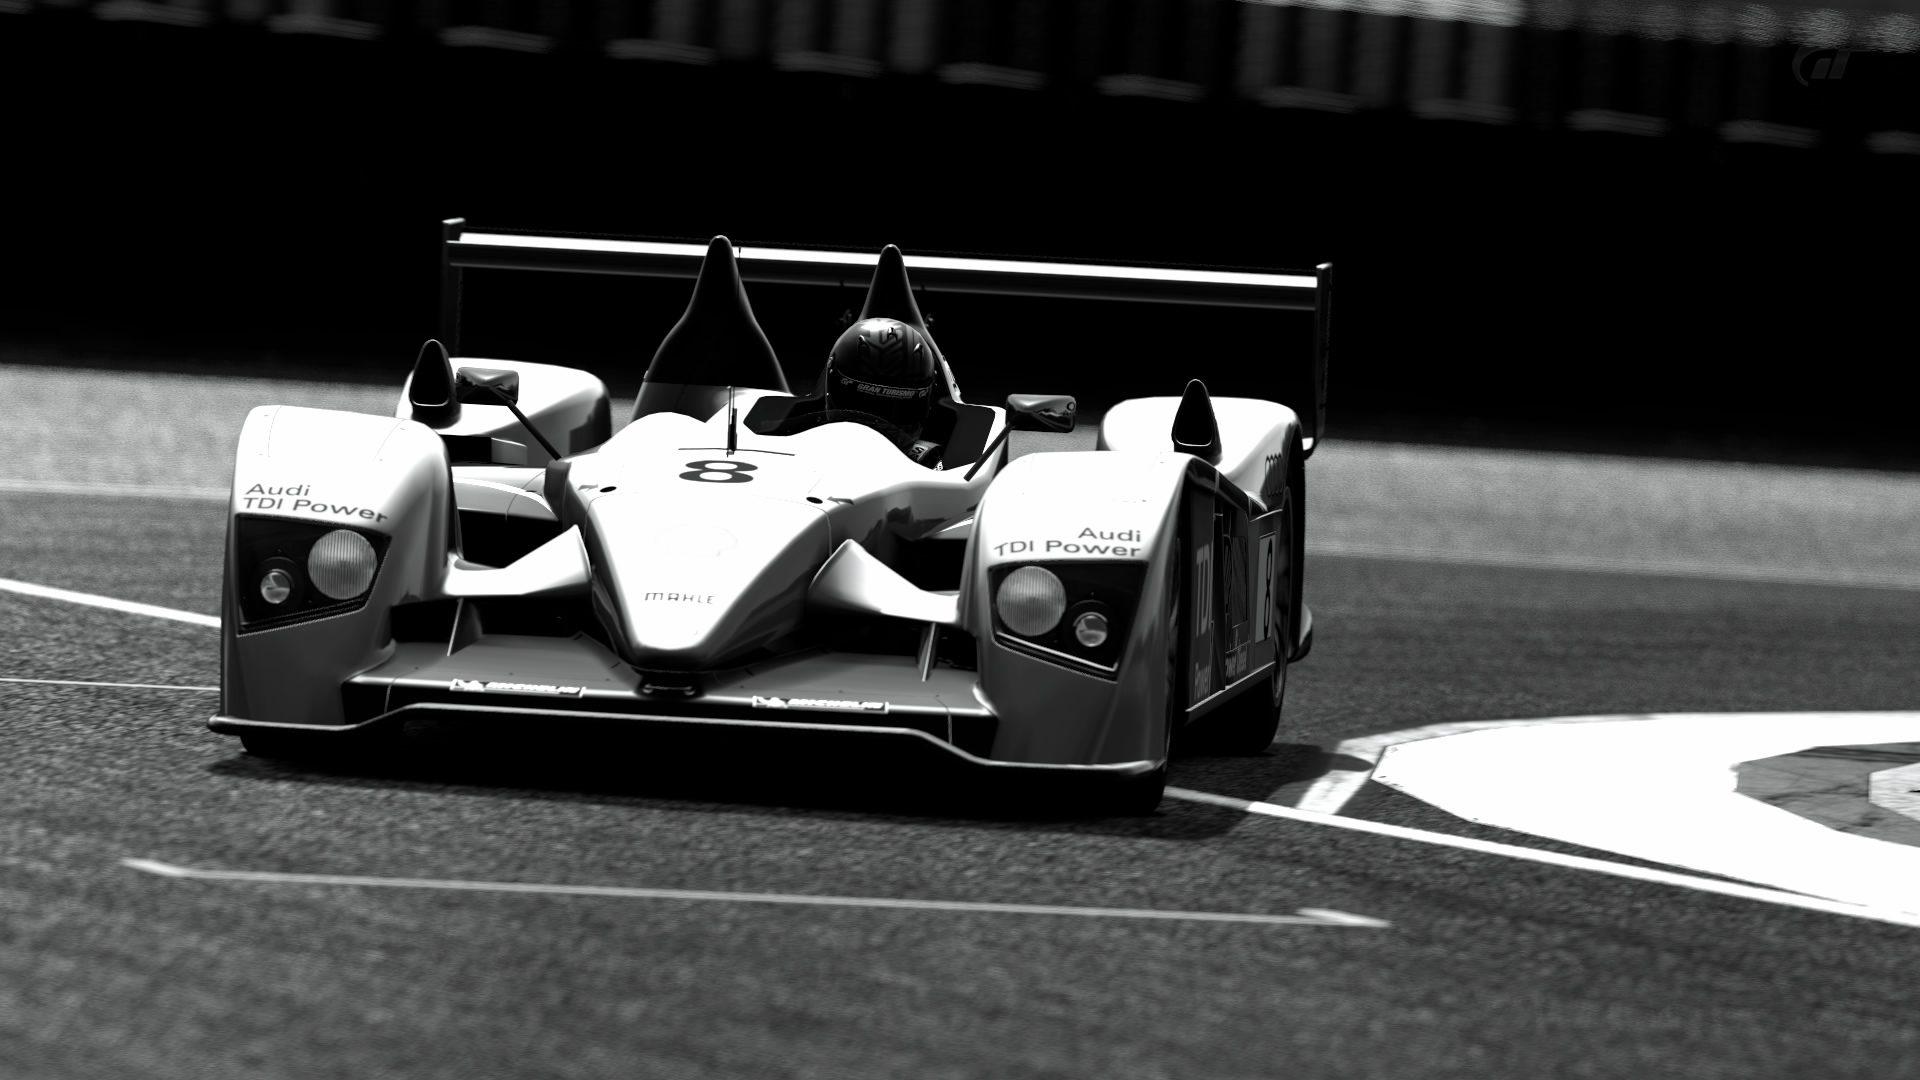 Circuit de la Sarthe 2013_1.jpg